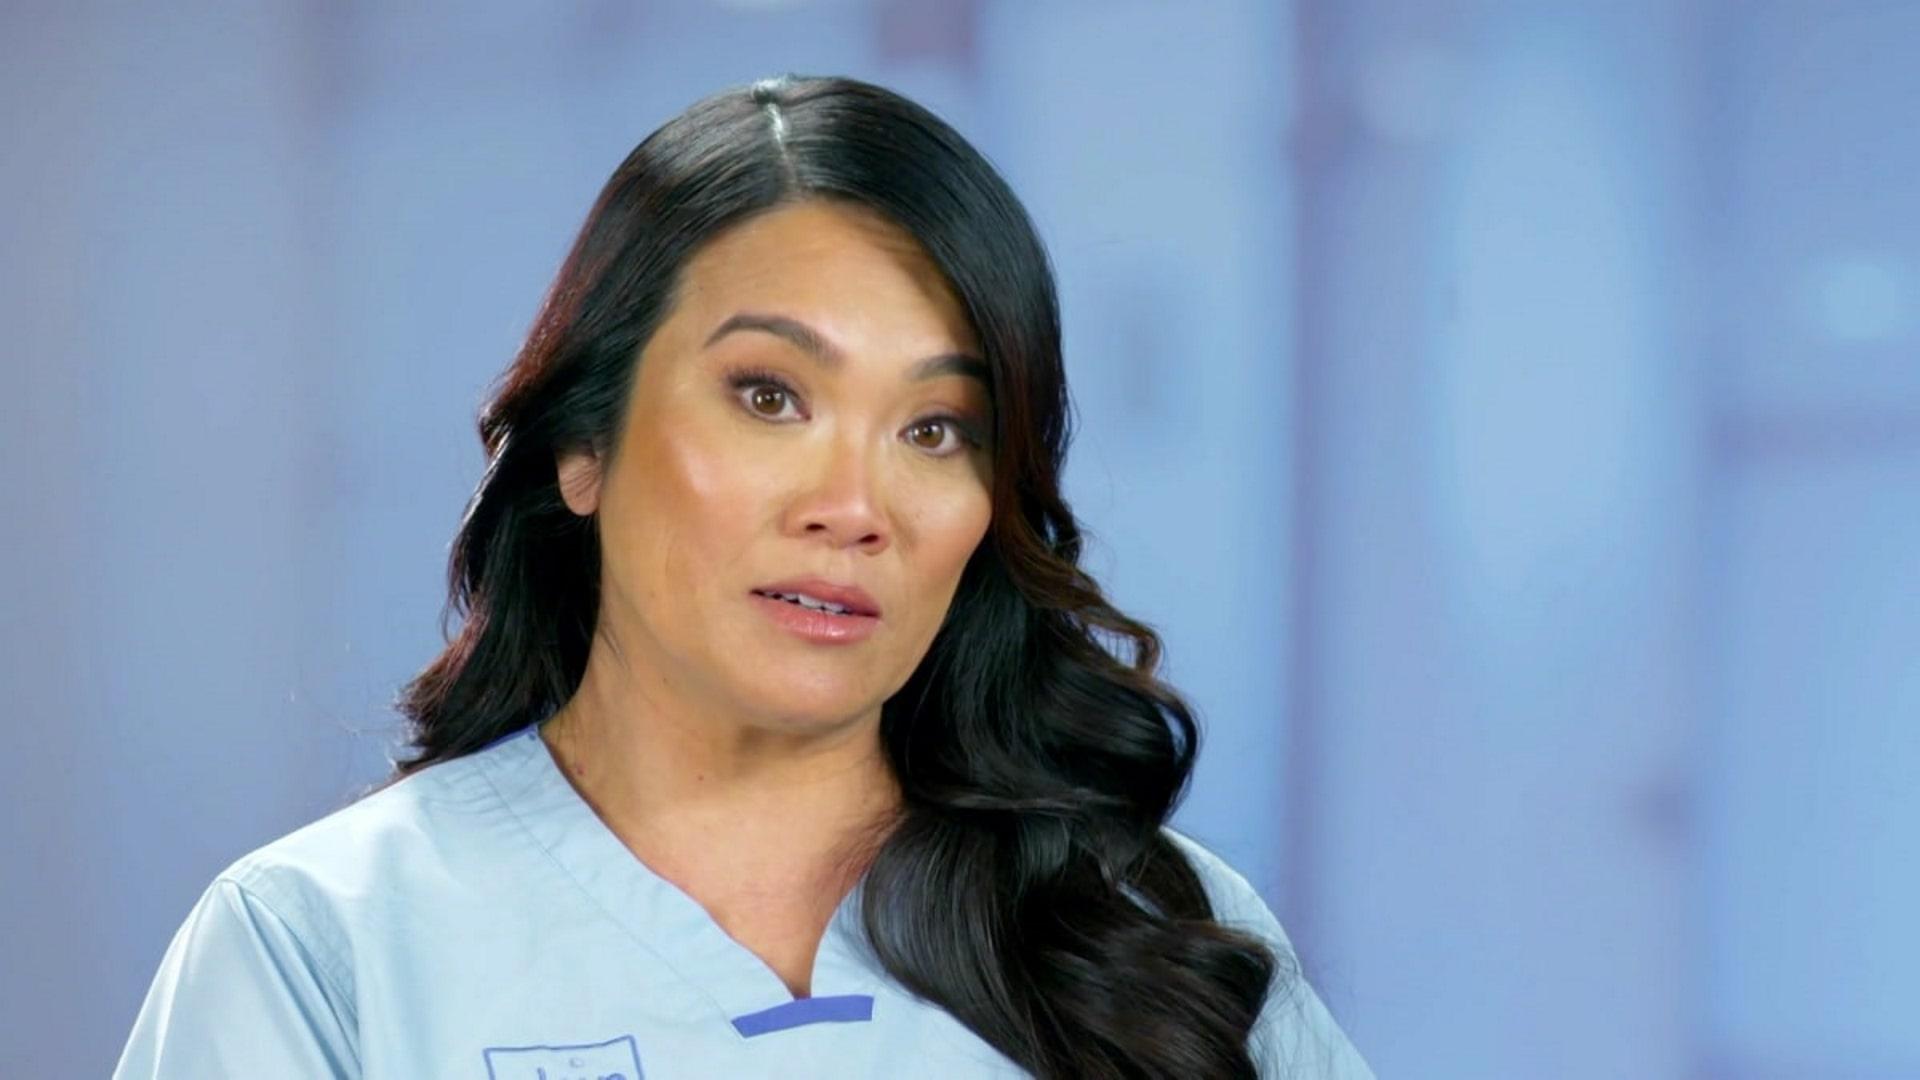 Dr Pimple Popper Season 3 Best Movies Tv Shows Online